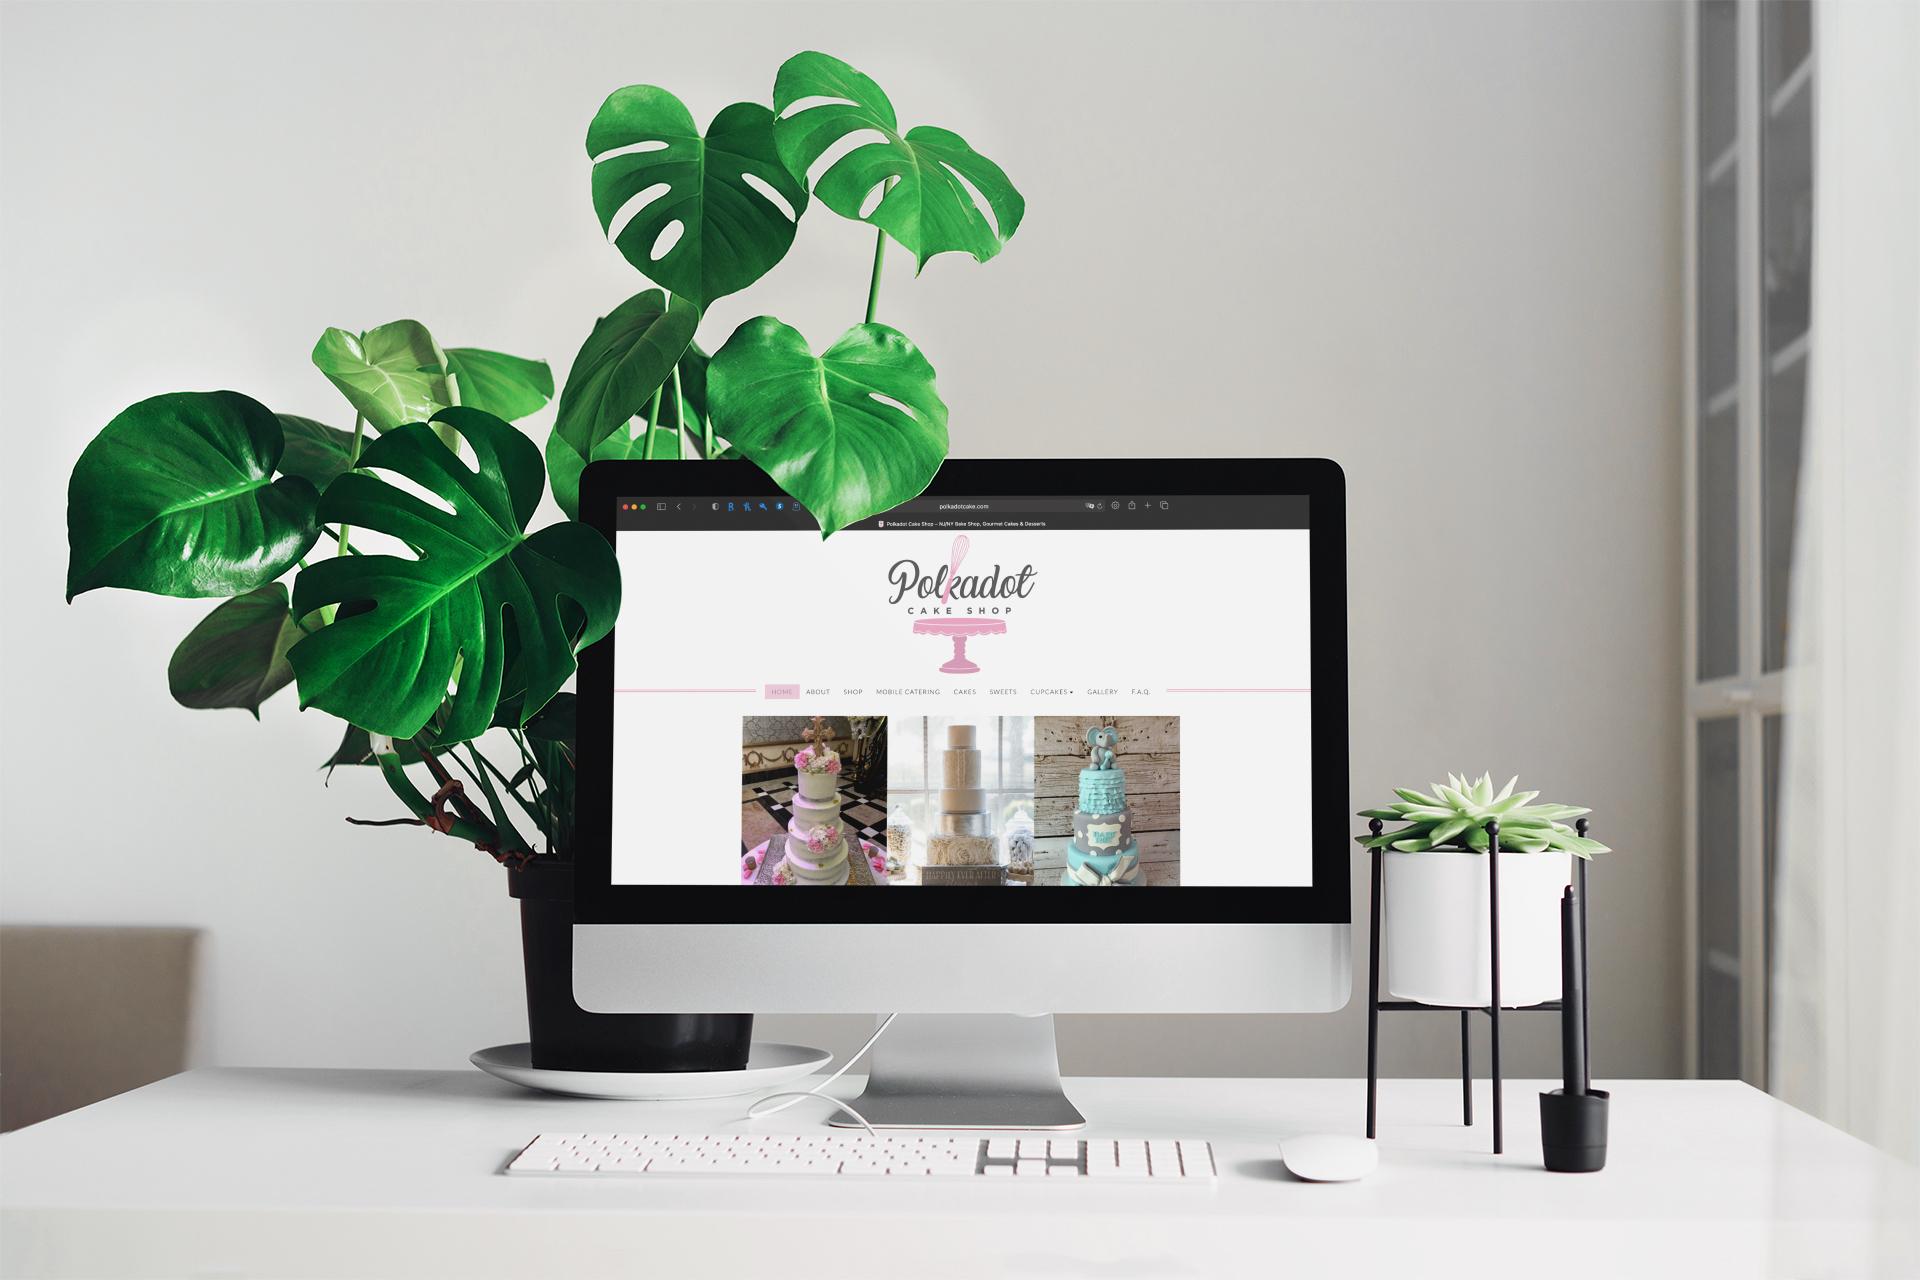 RRSanchez - Polkadot Cake Website Design